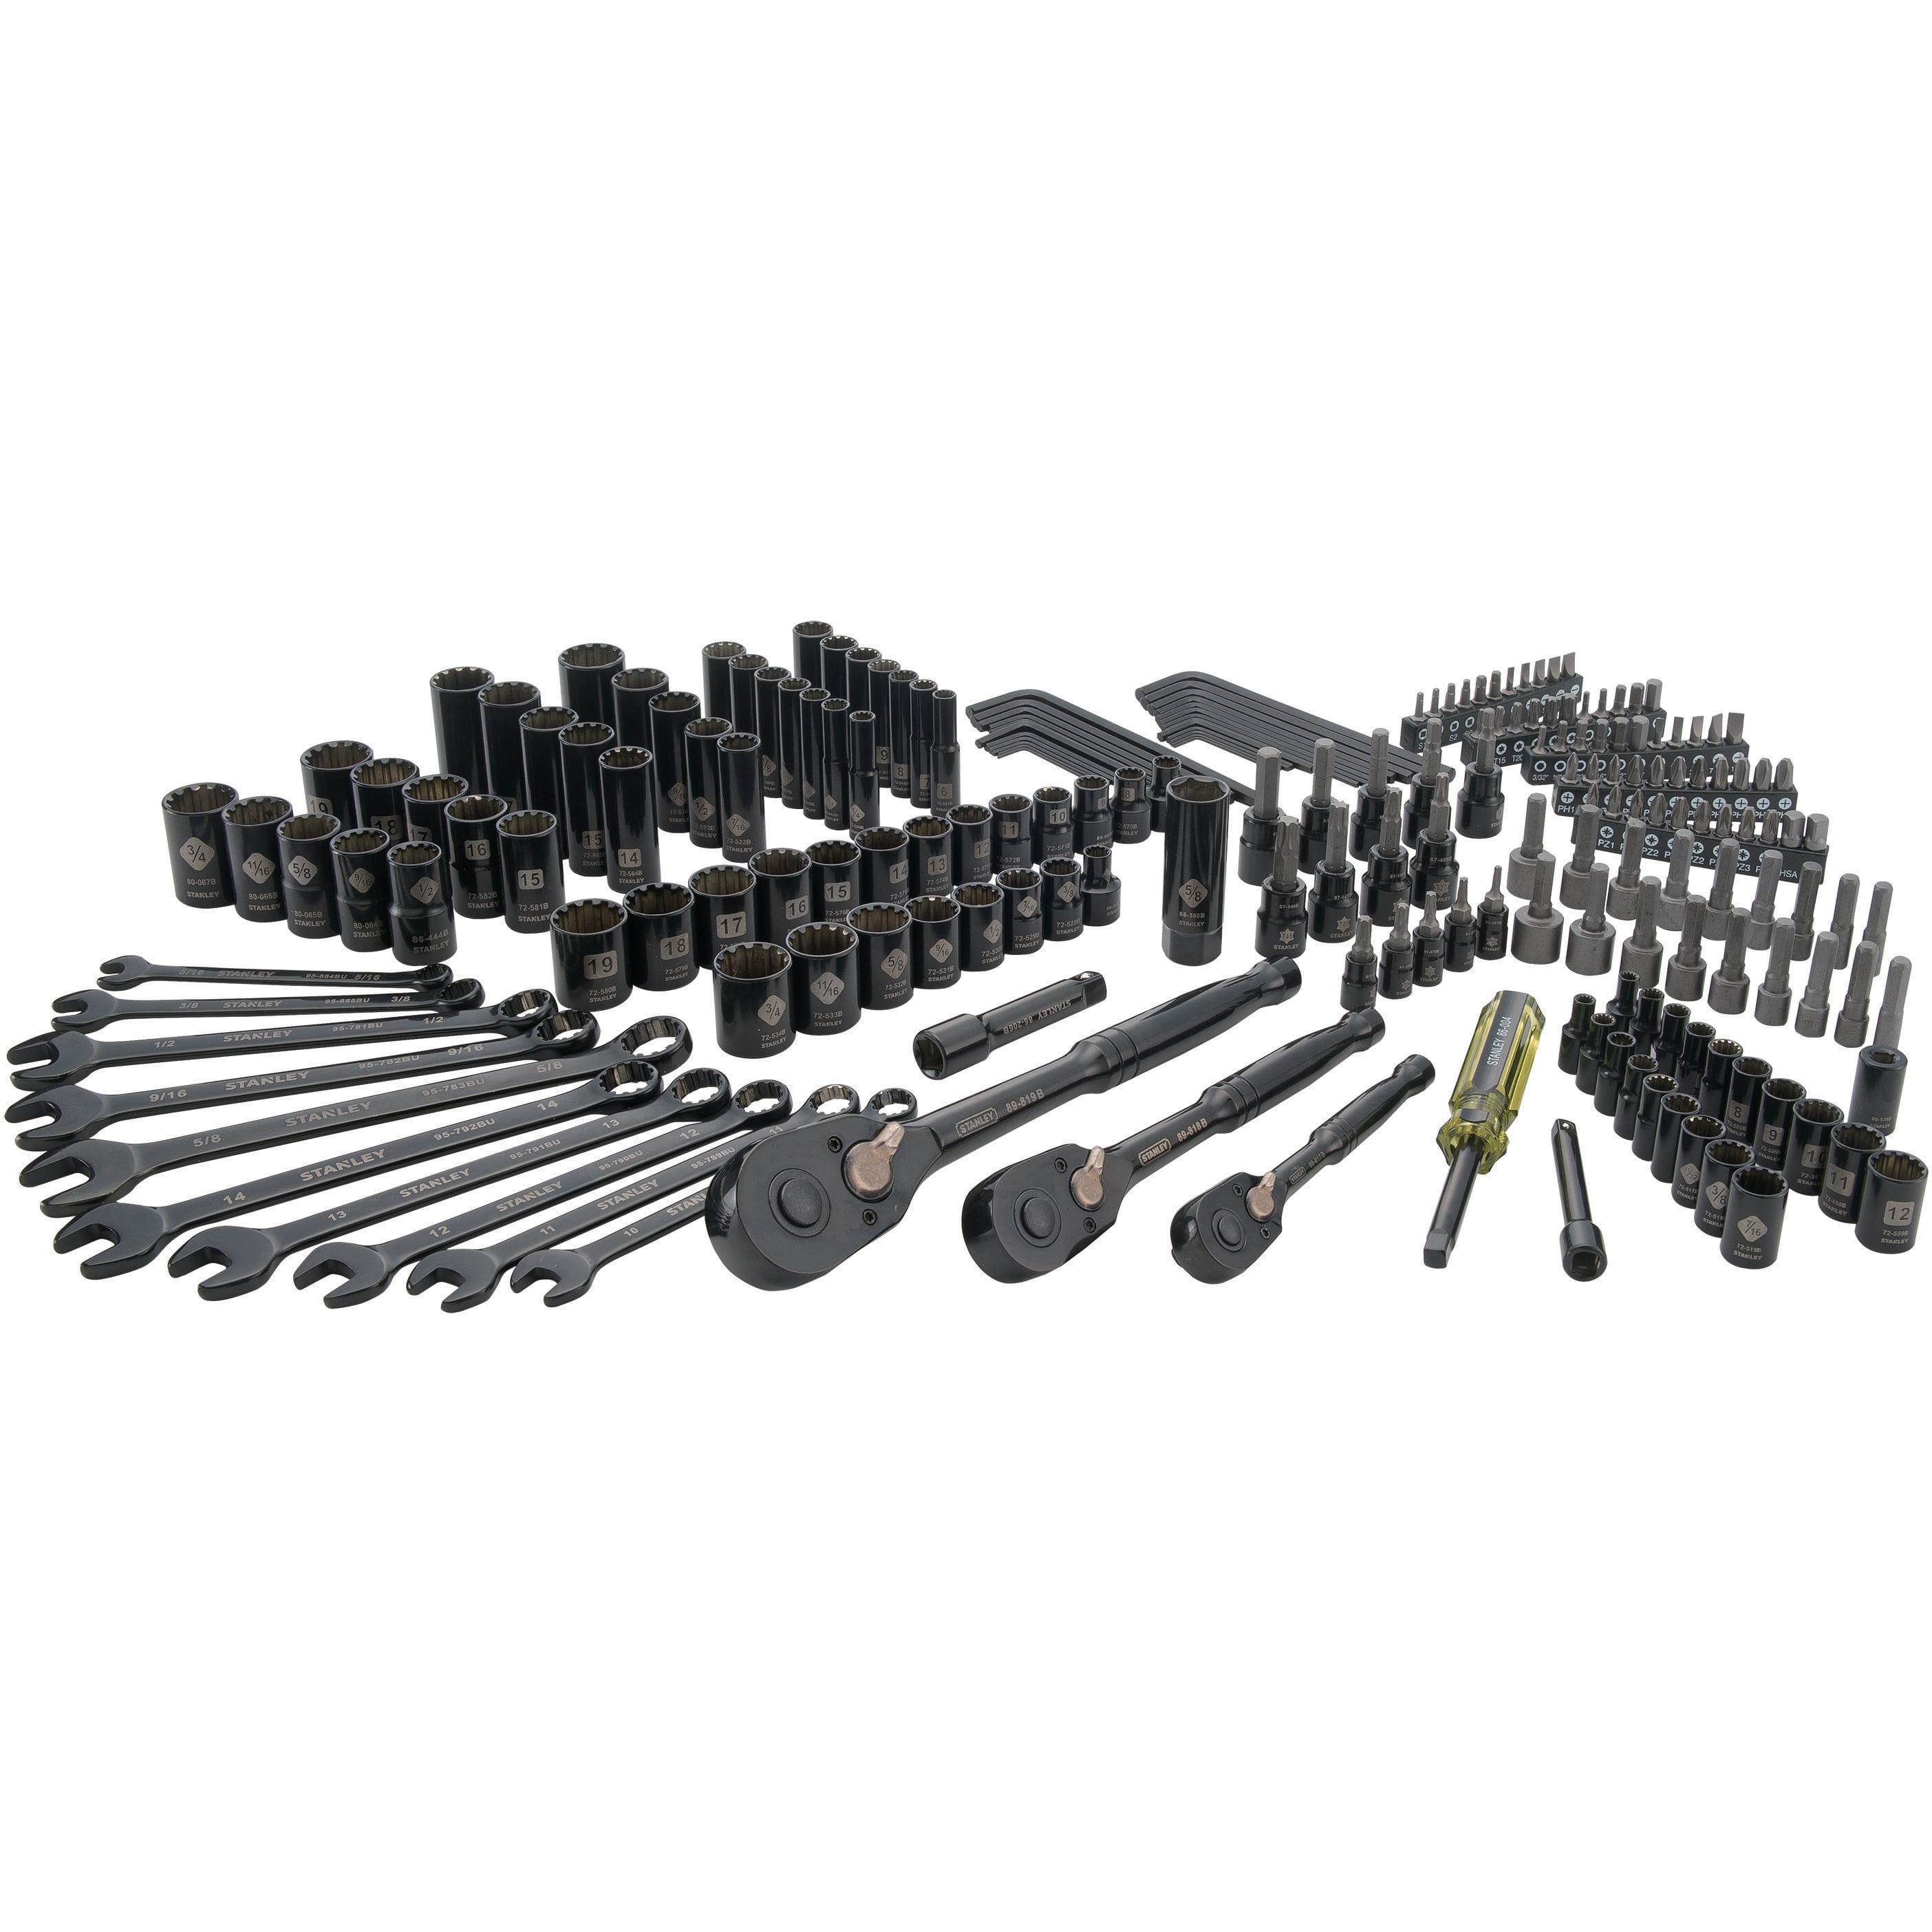 STANLEY STMT81190 207-Piece Black Chrome Universal Mechanics Tool Set